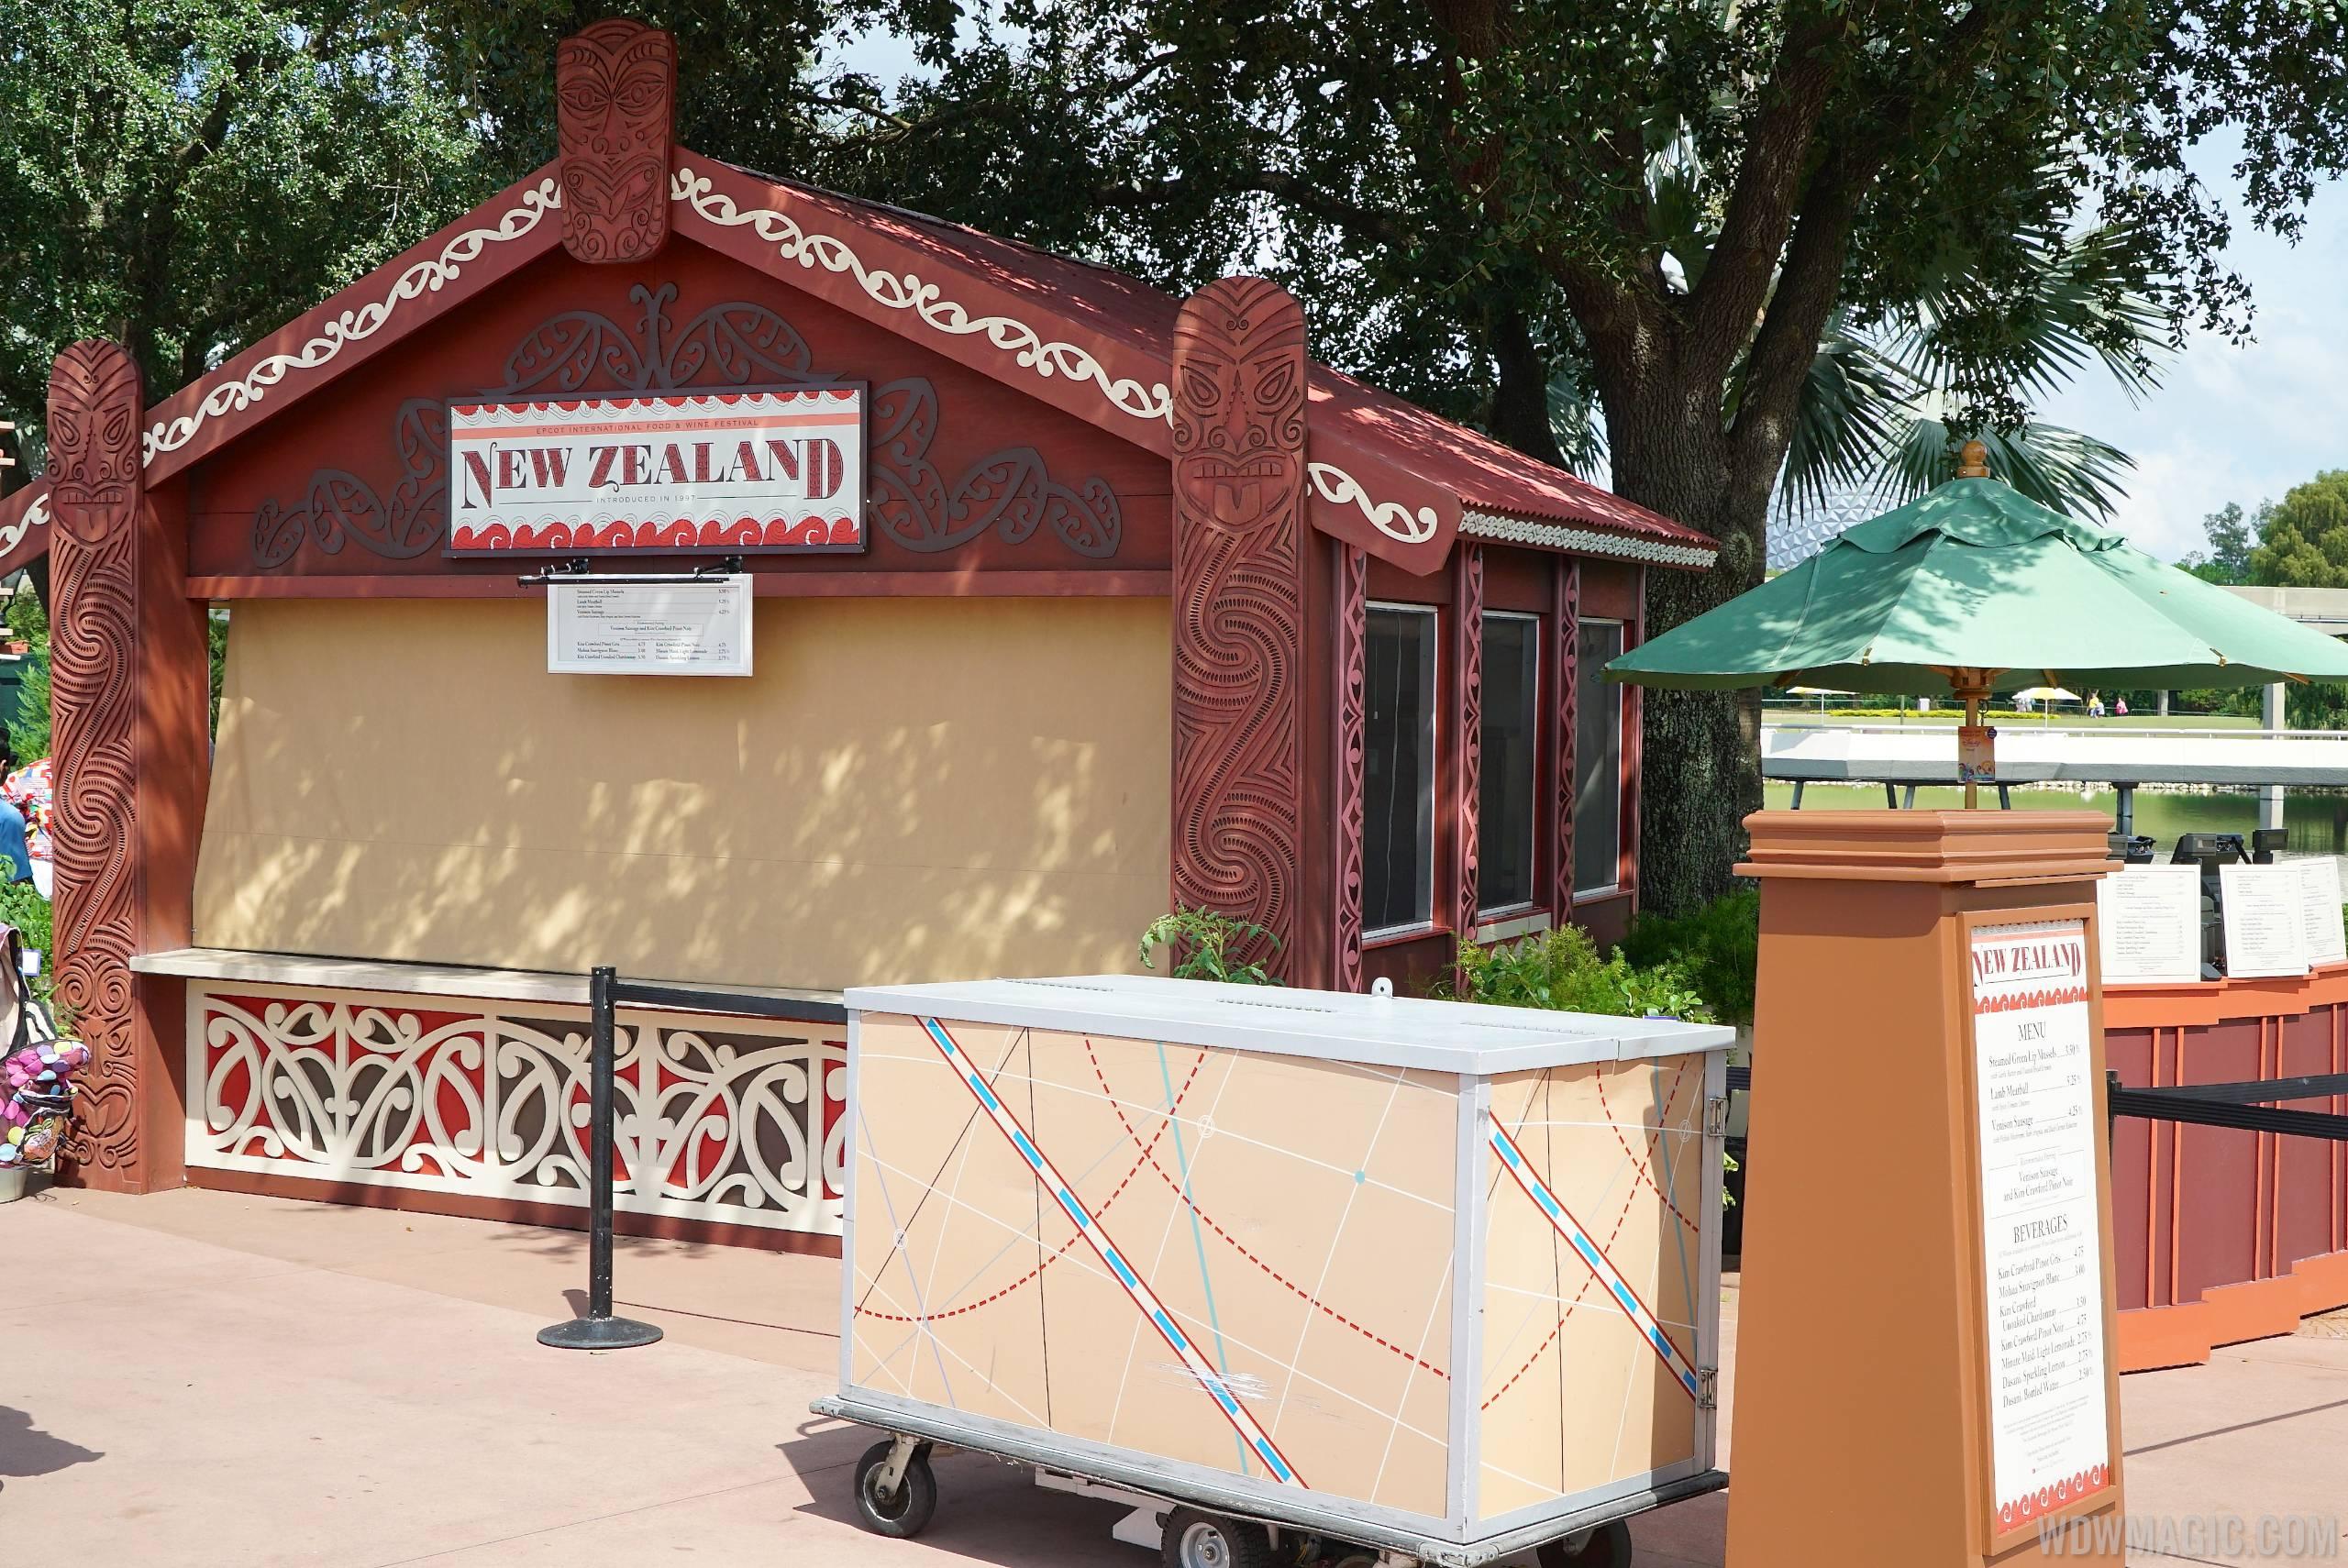 New Zealand Food and Wine kiosk